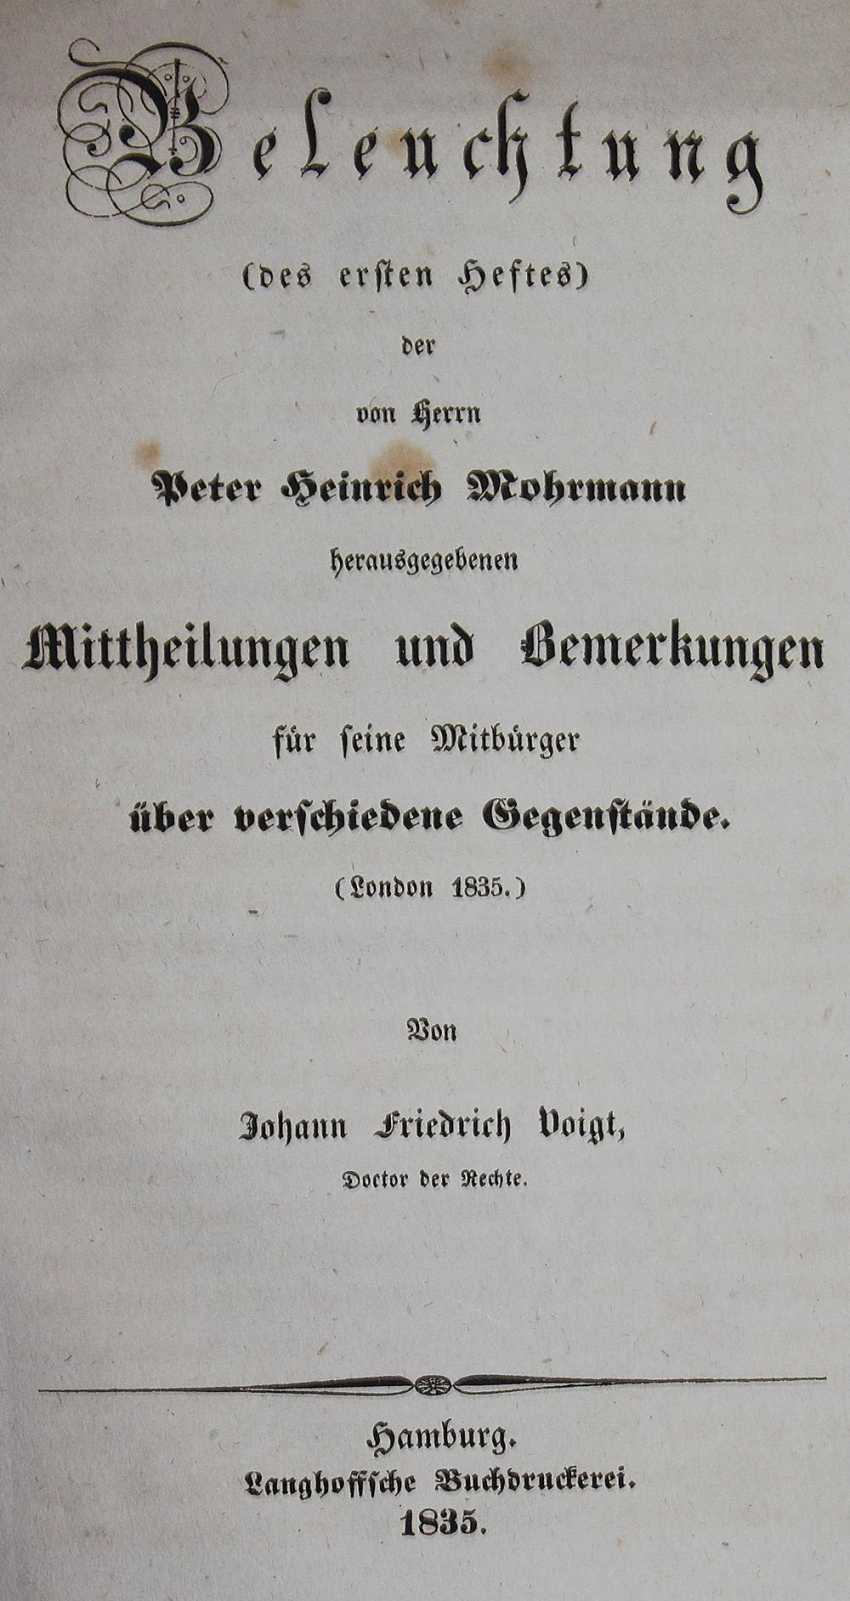 Voigt, J. F. - photo 1